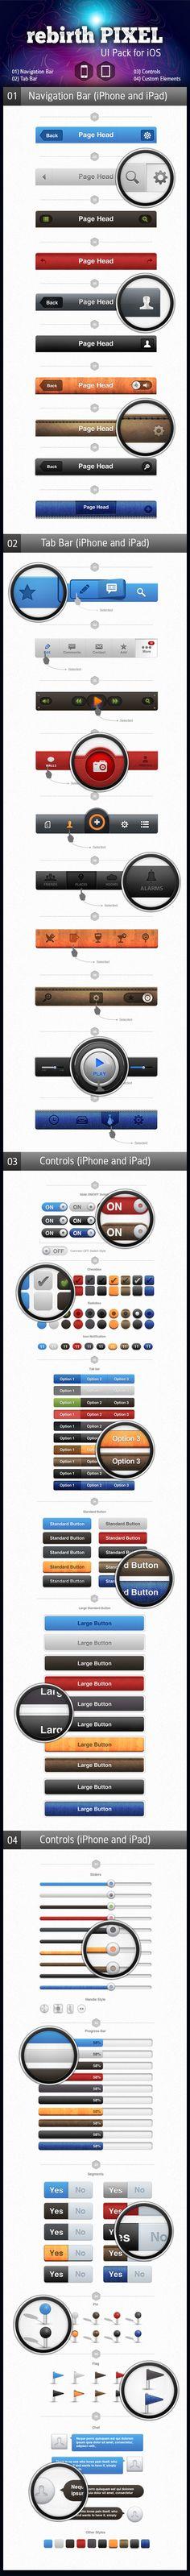 UI Design Kit for iOS